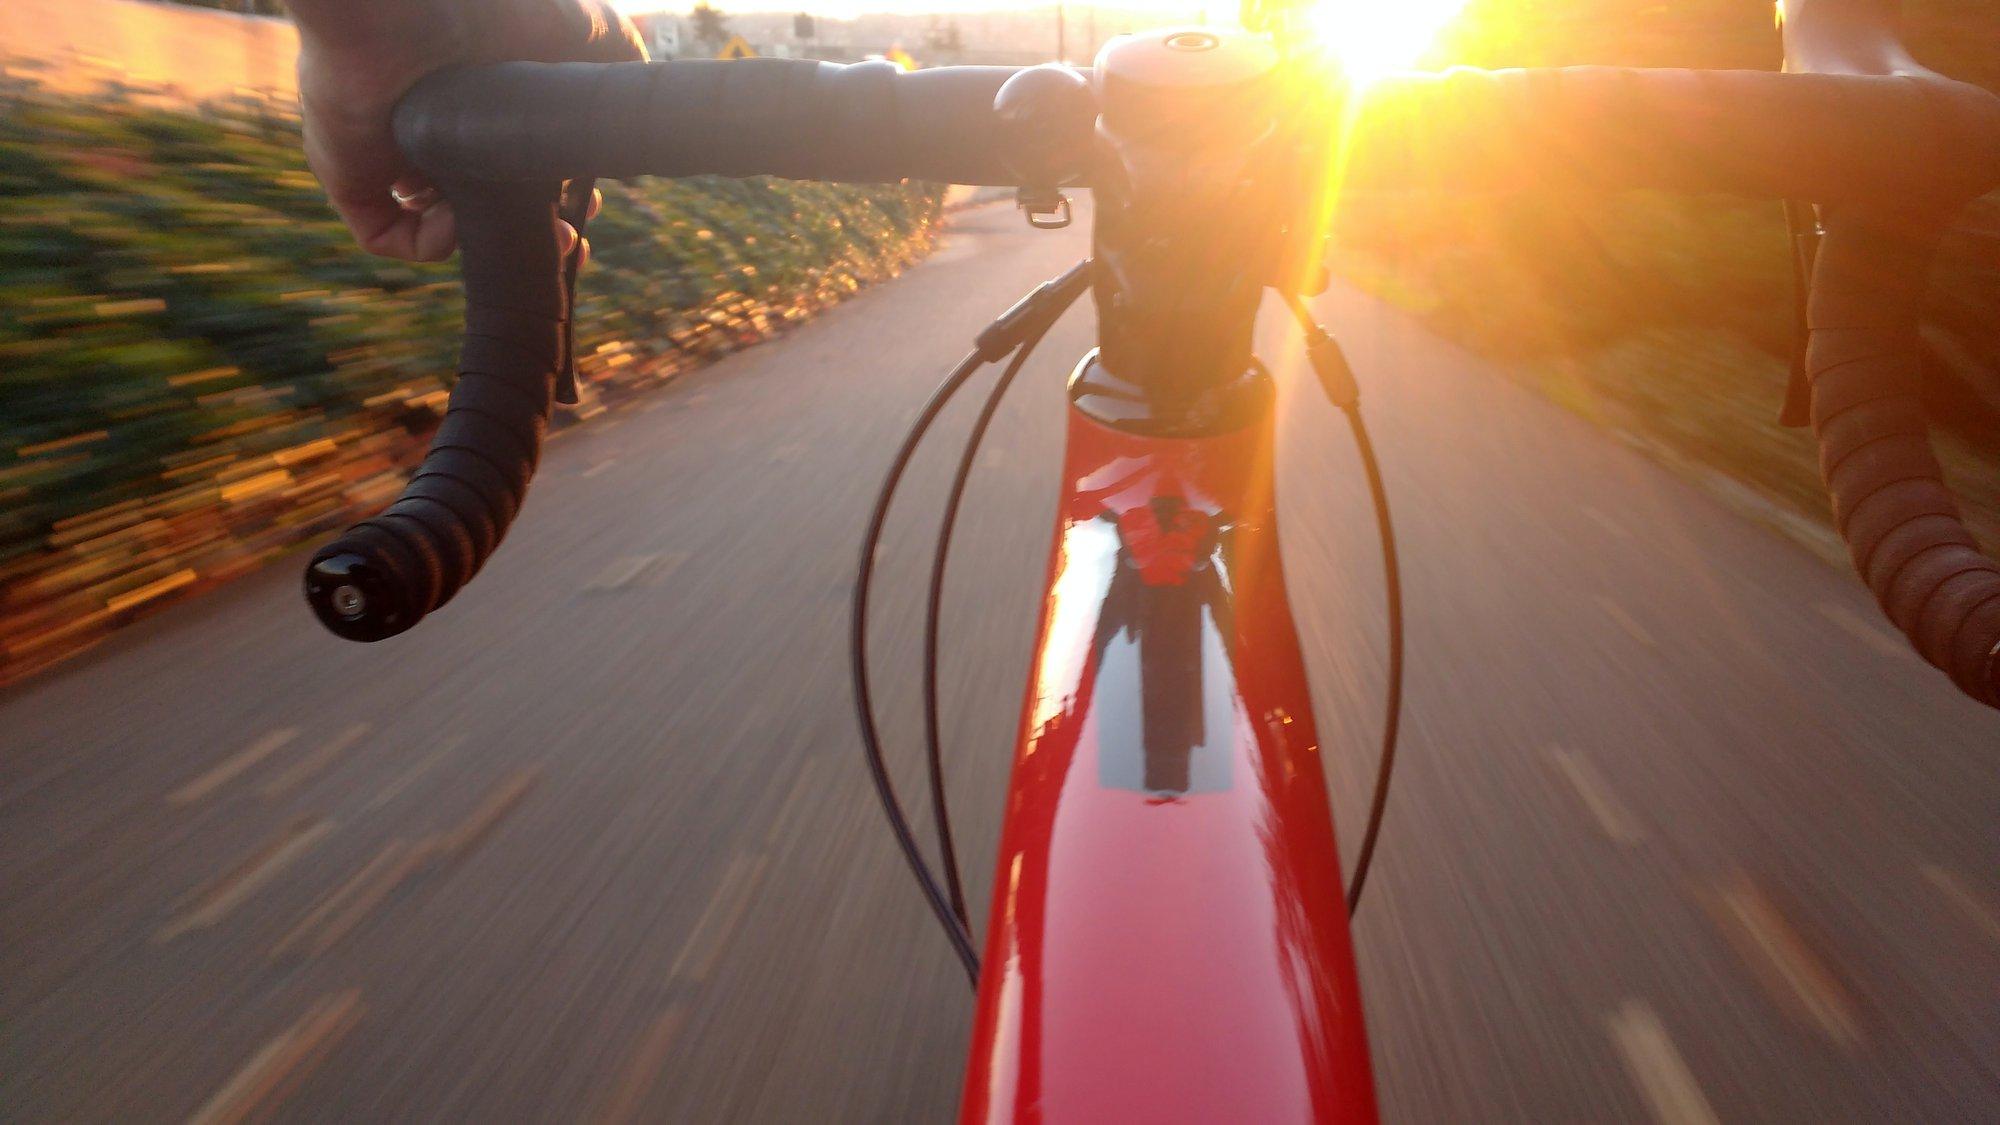 action-bicycling-bike-biking-287398.jpg